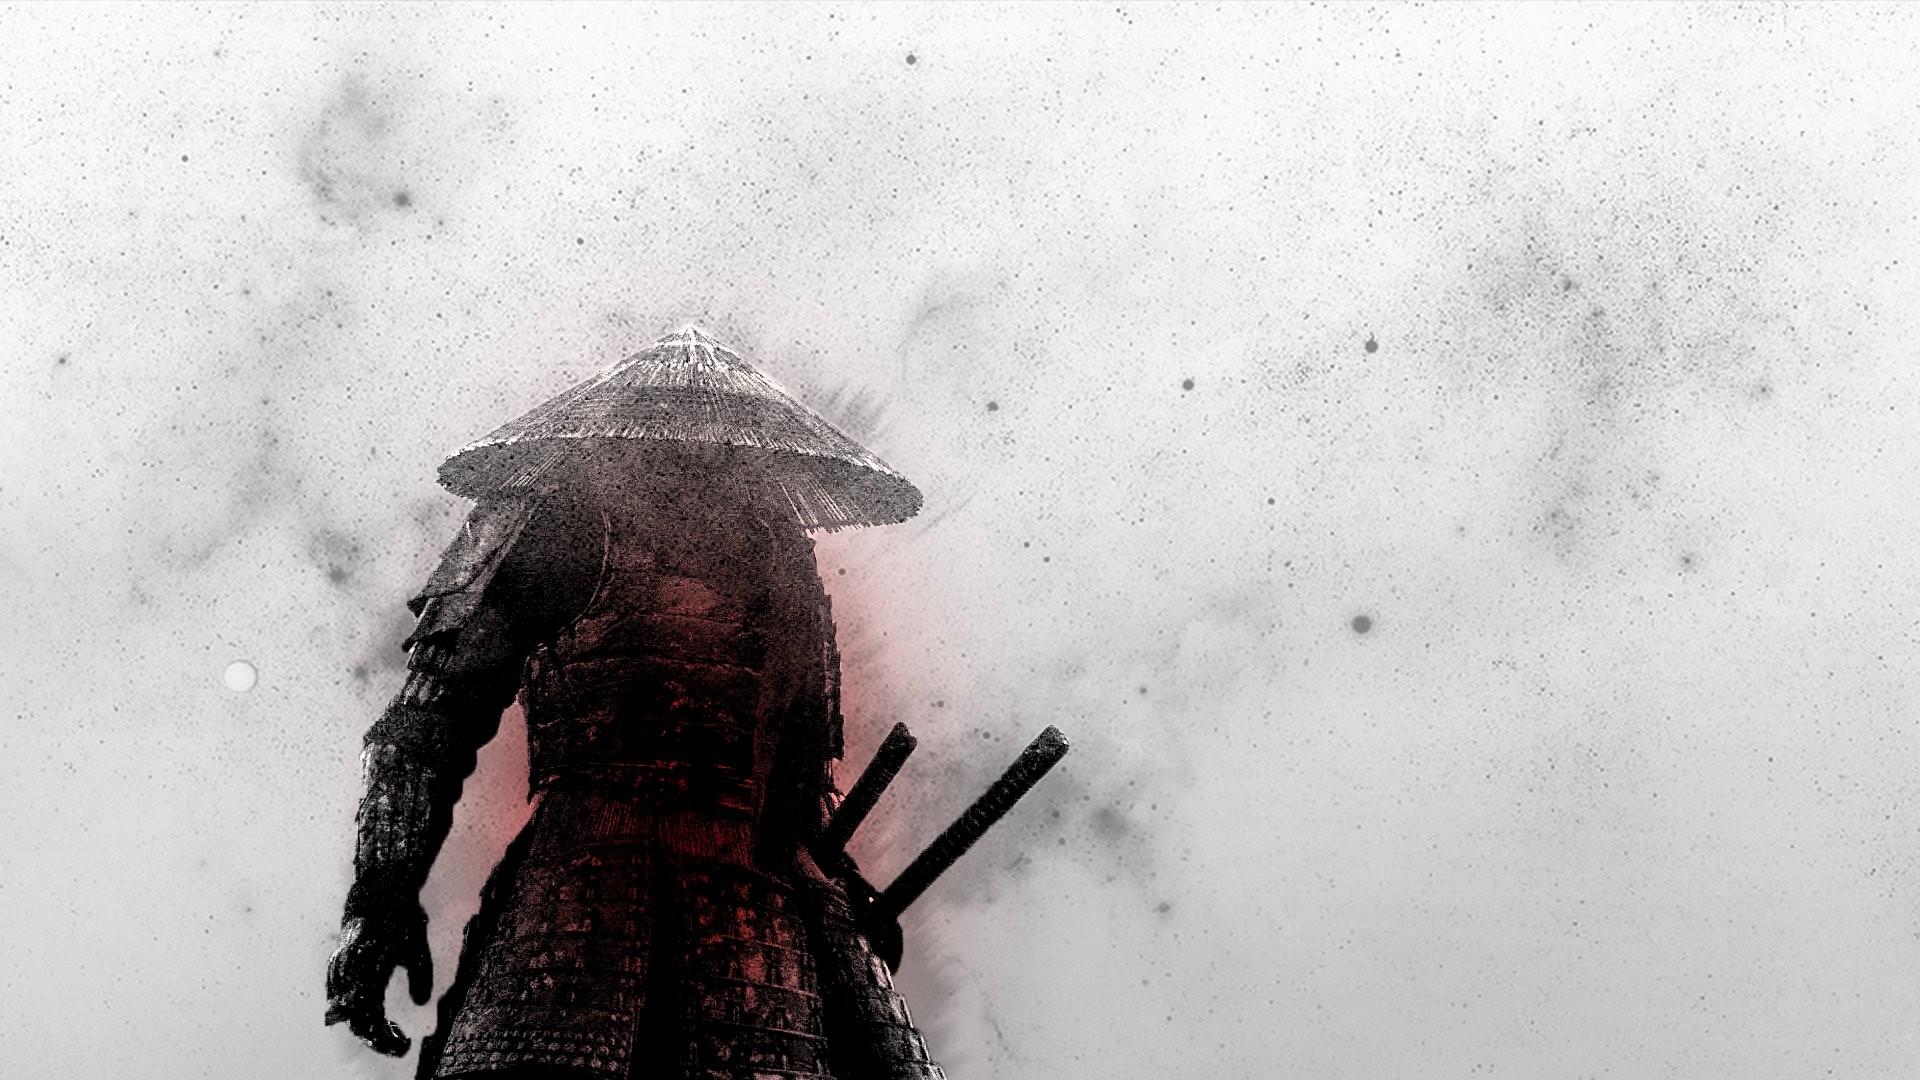 Samurai wallpaper by nihilusdesigns-d6jmzu5 wallpaper   .